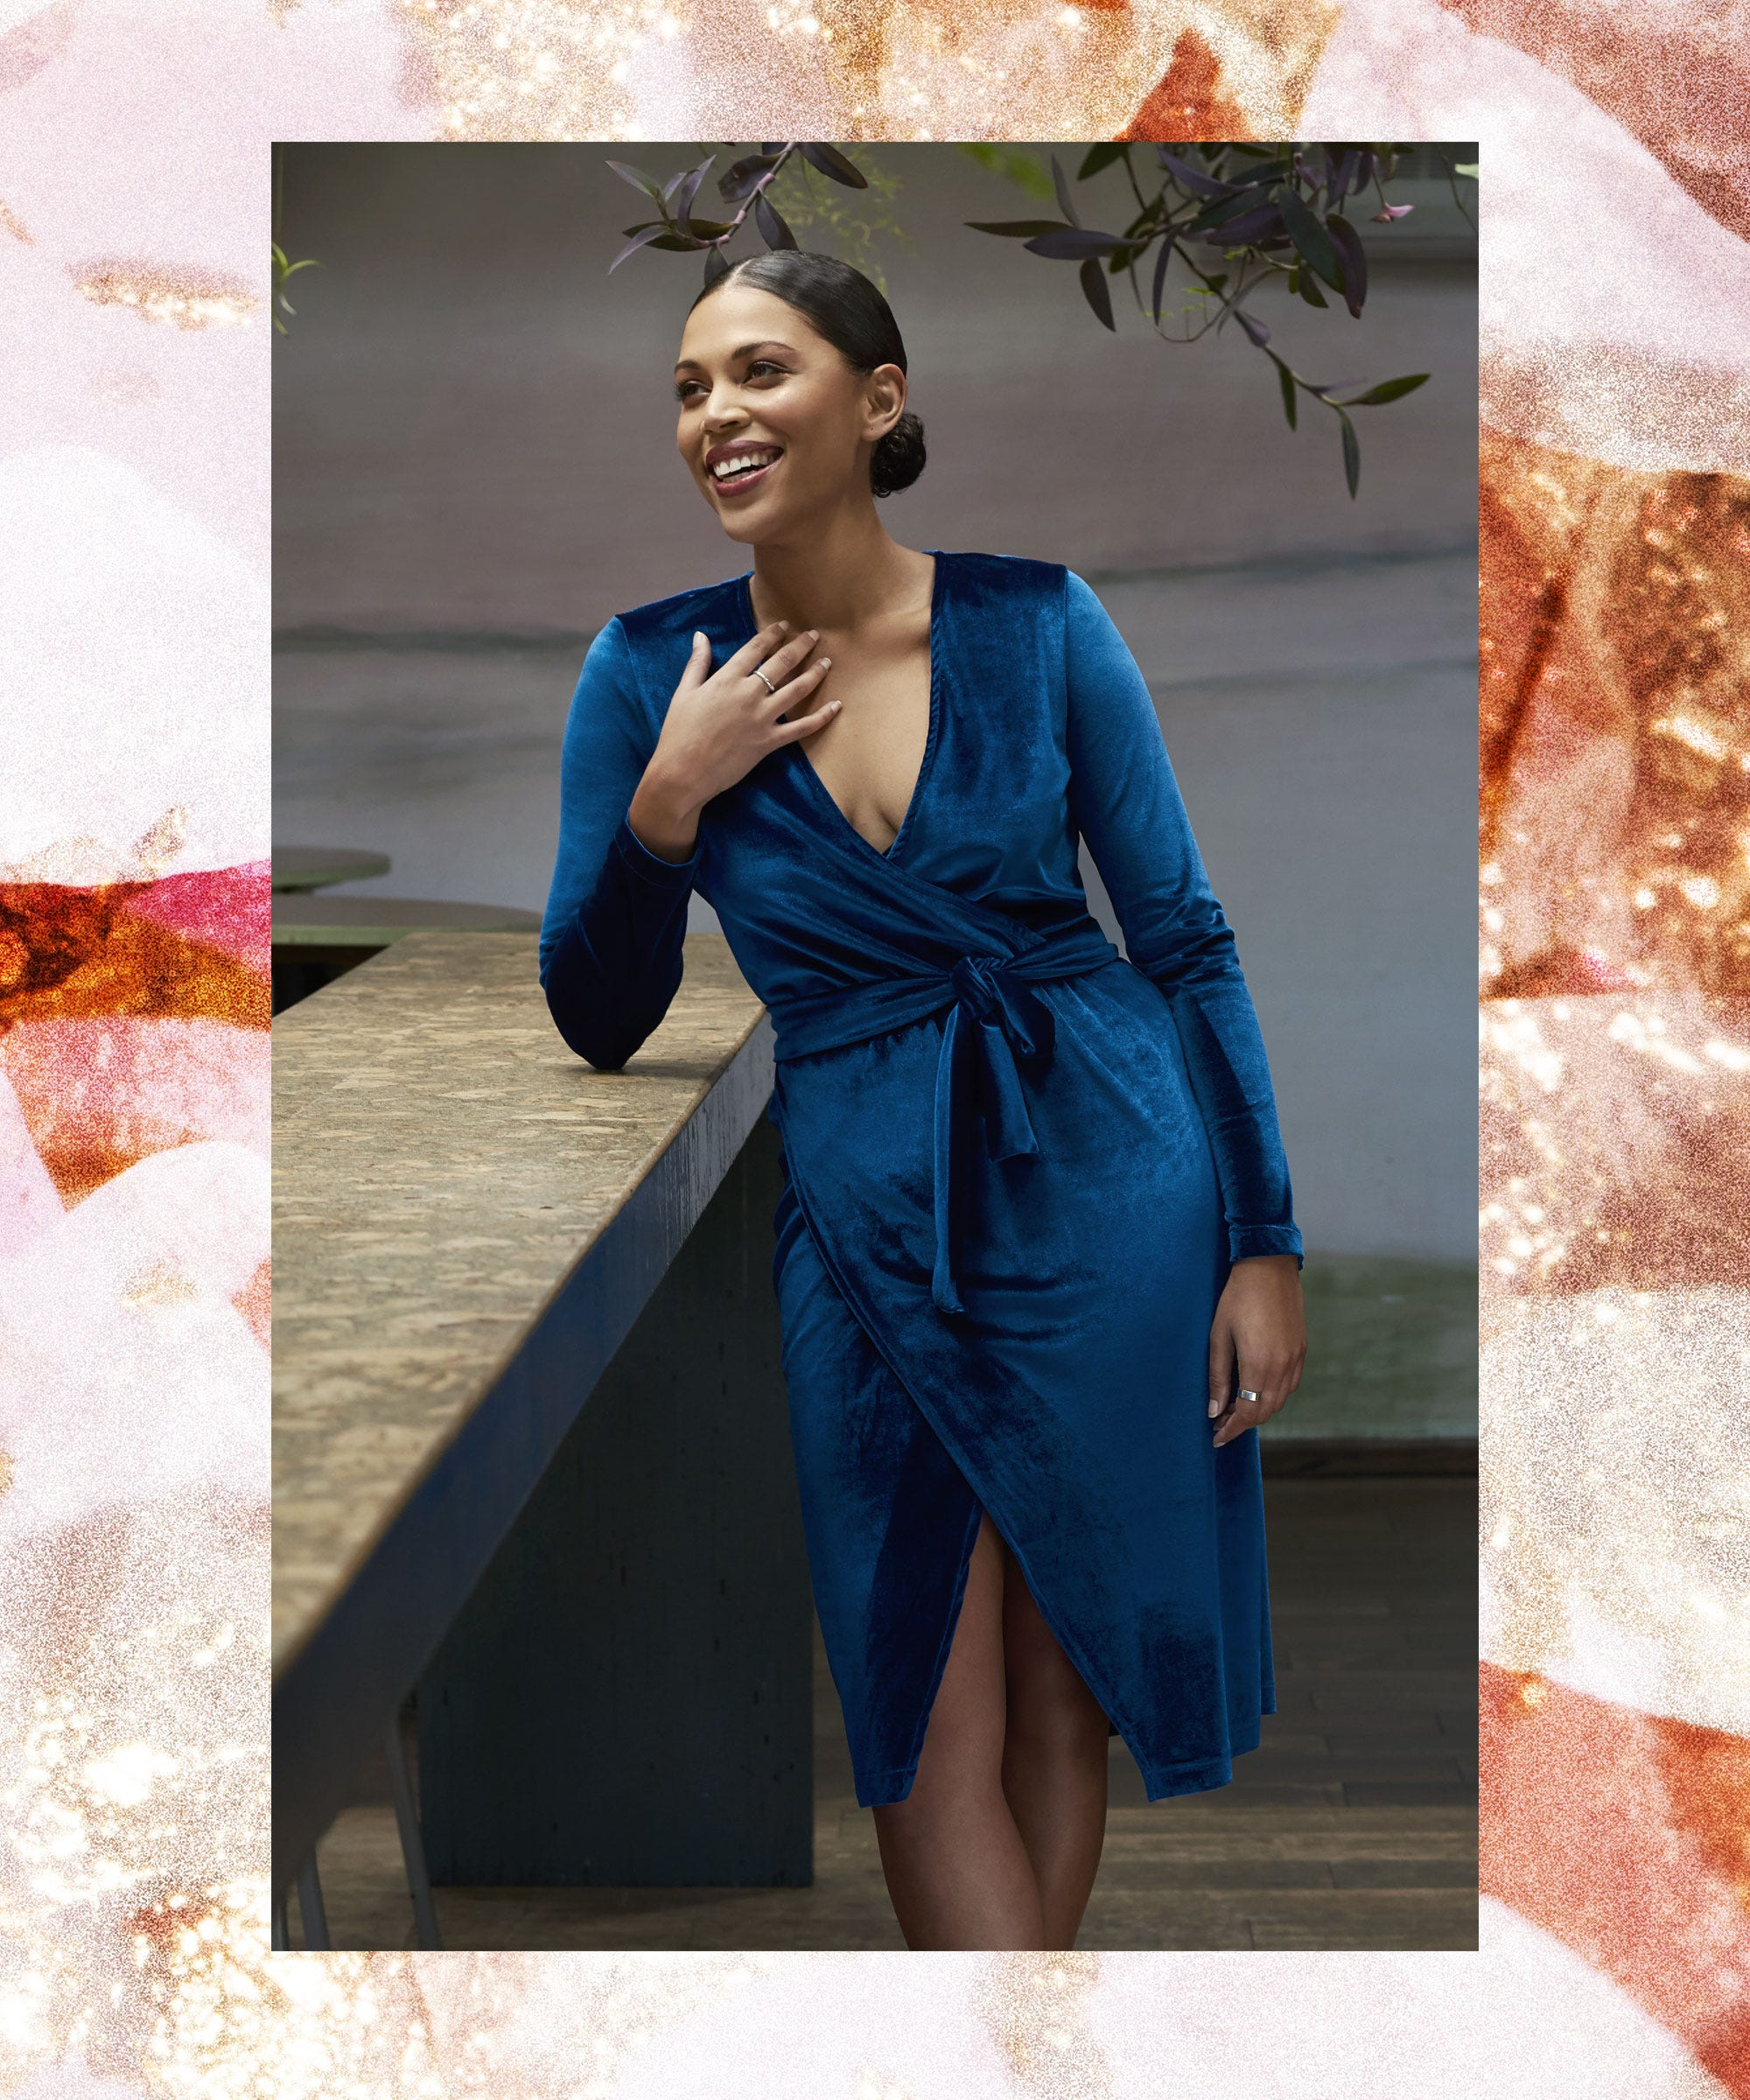 Mcgowans Rose gorgeous pixel print dress